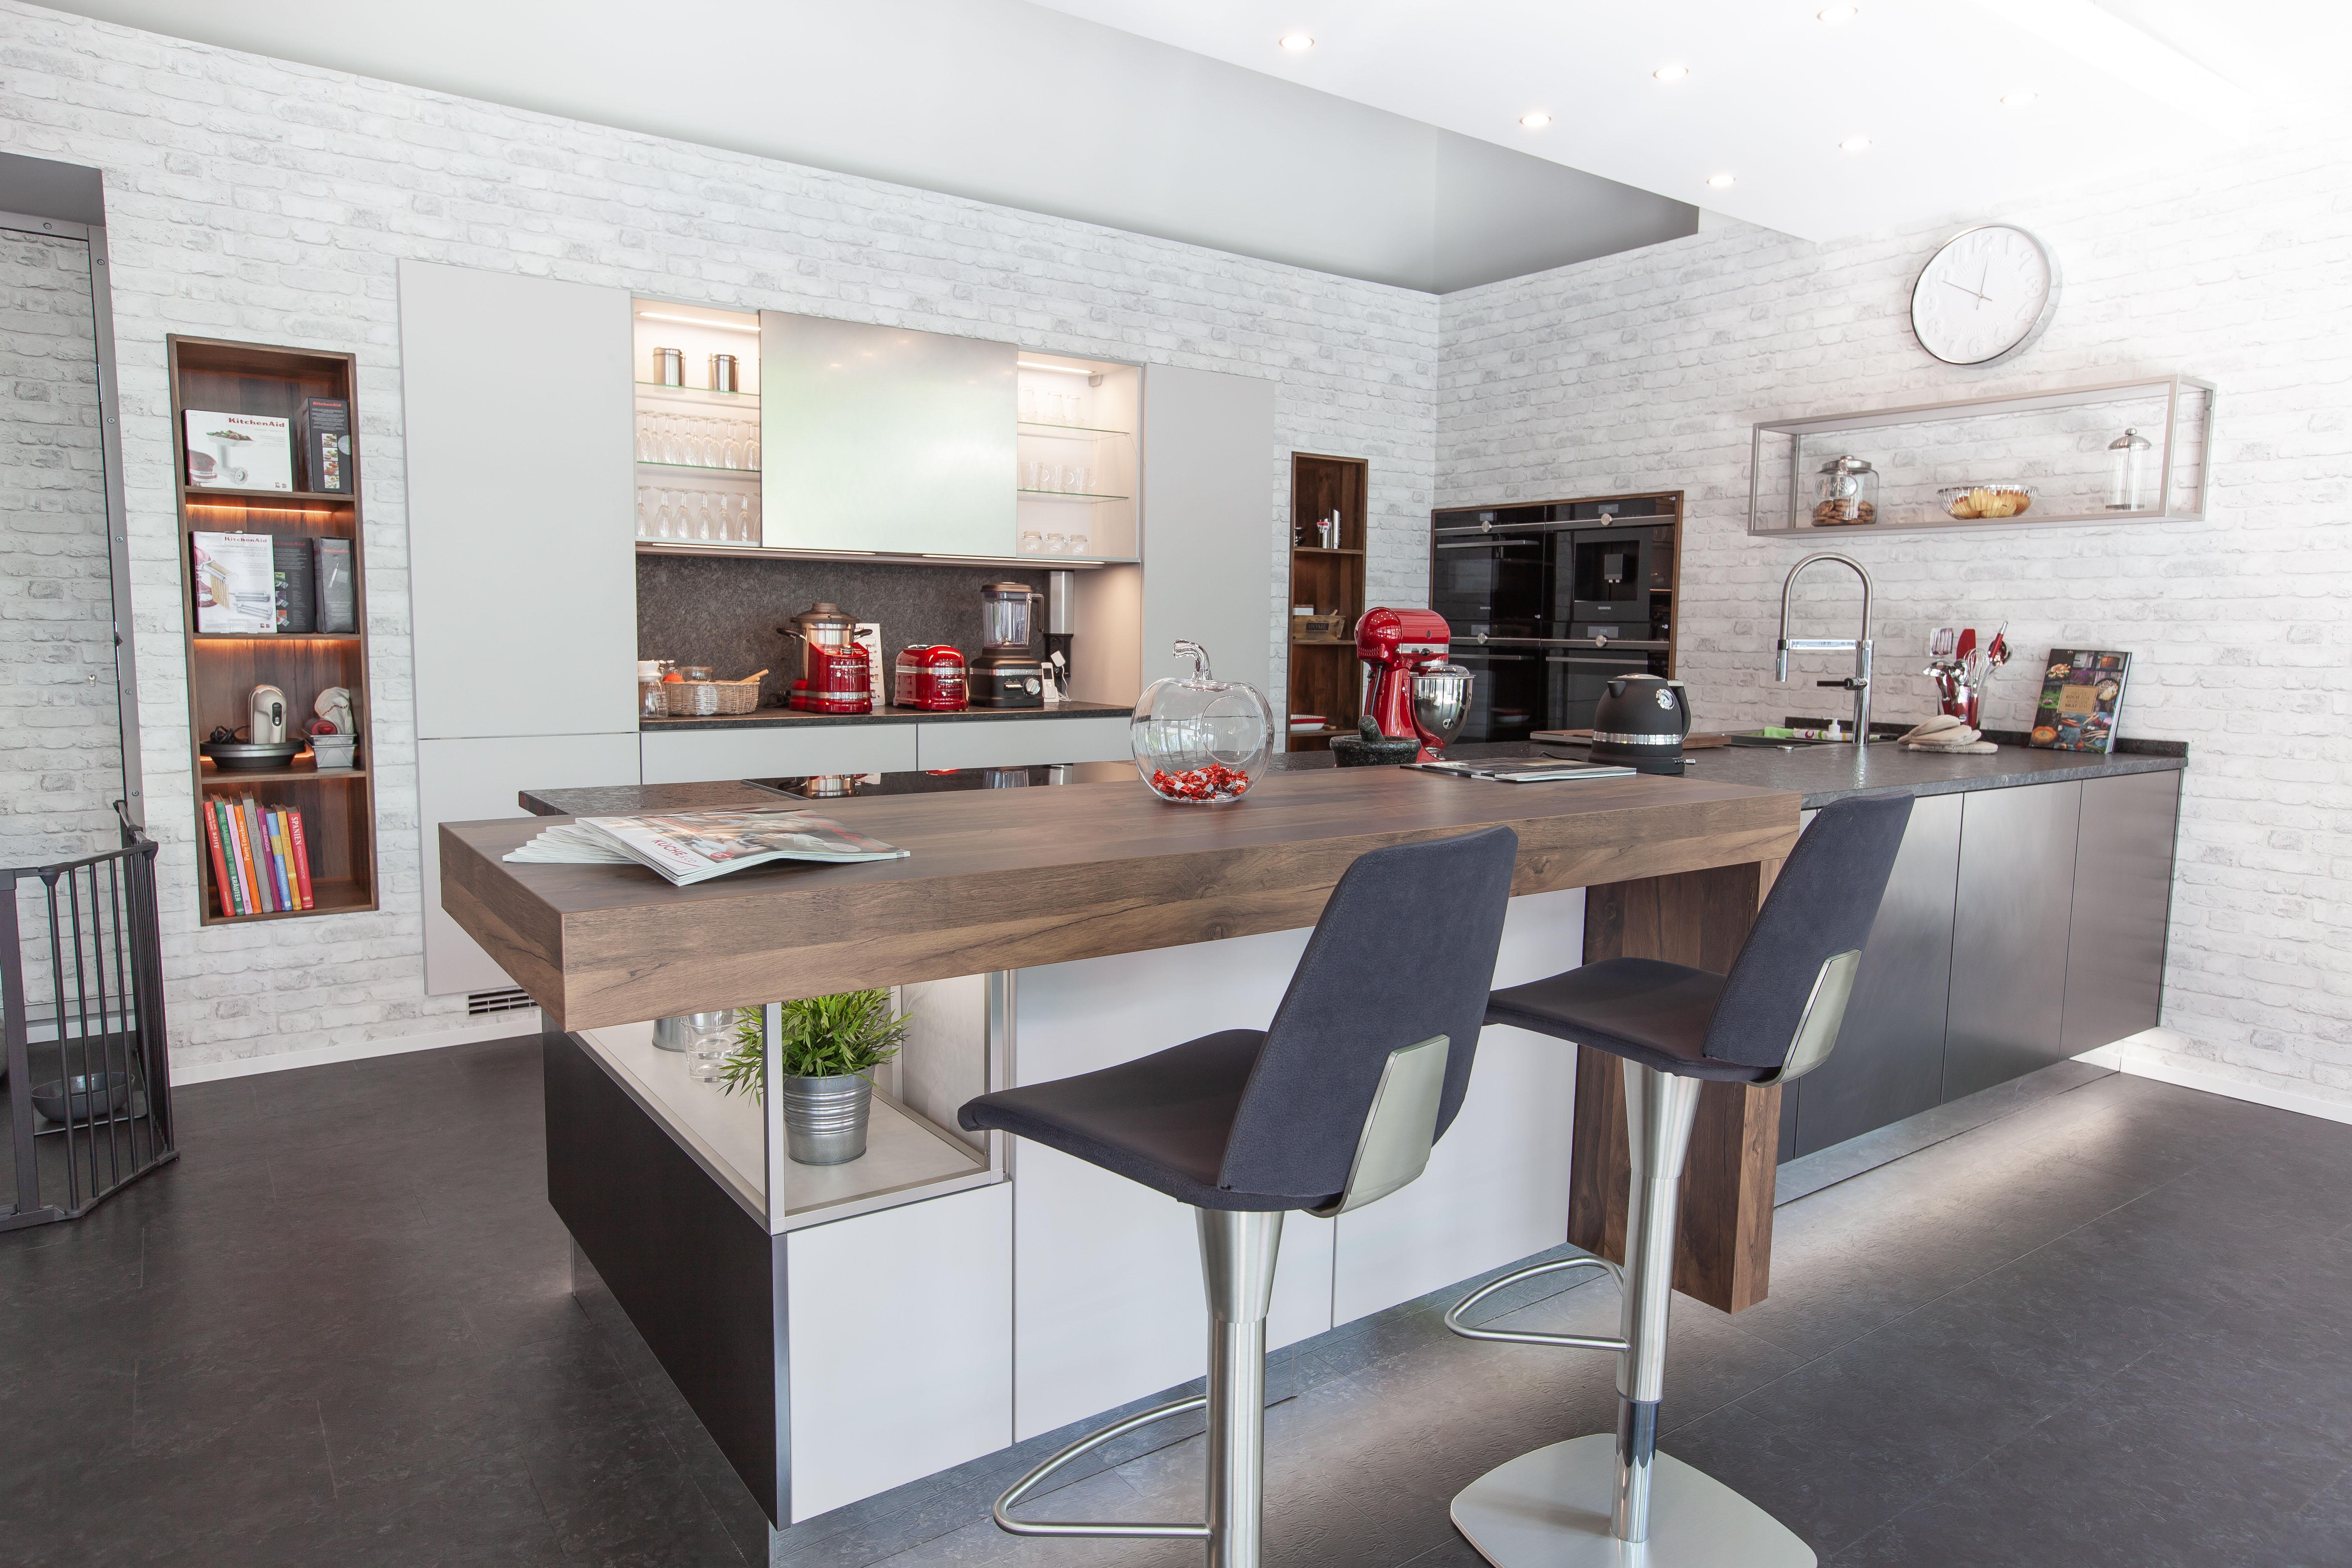 haus garten m bel in hamburg infobel deutschland. Black Bedroom Furniture Sets. Home Design Ideas